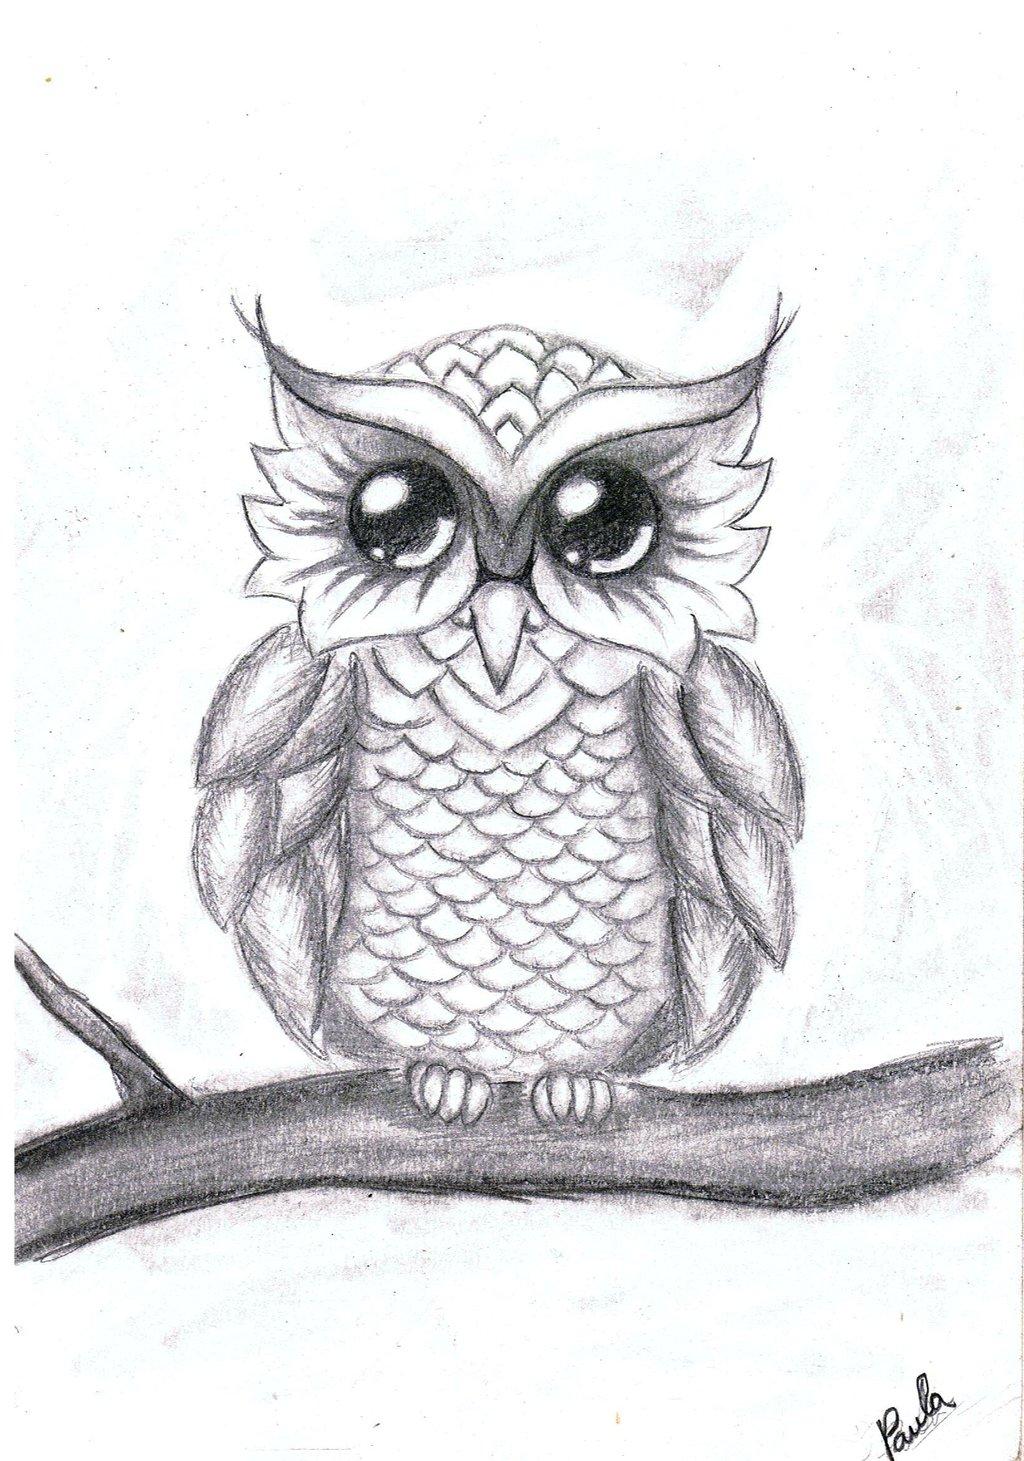 Drawn owl little owl Drawings Drawings of Cute cute